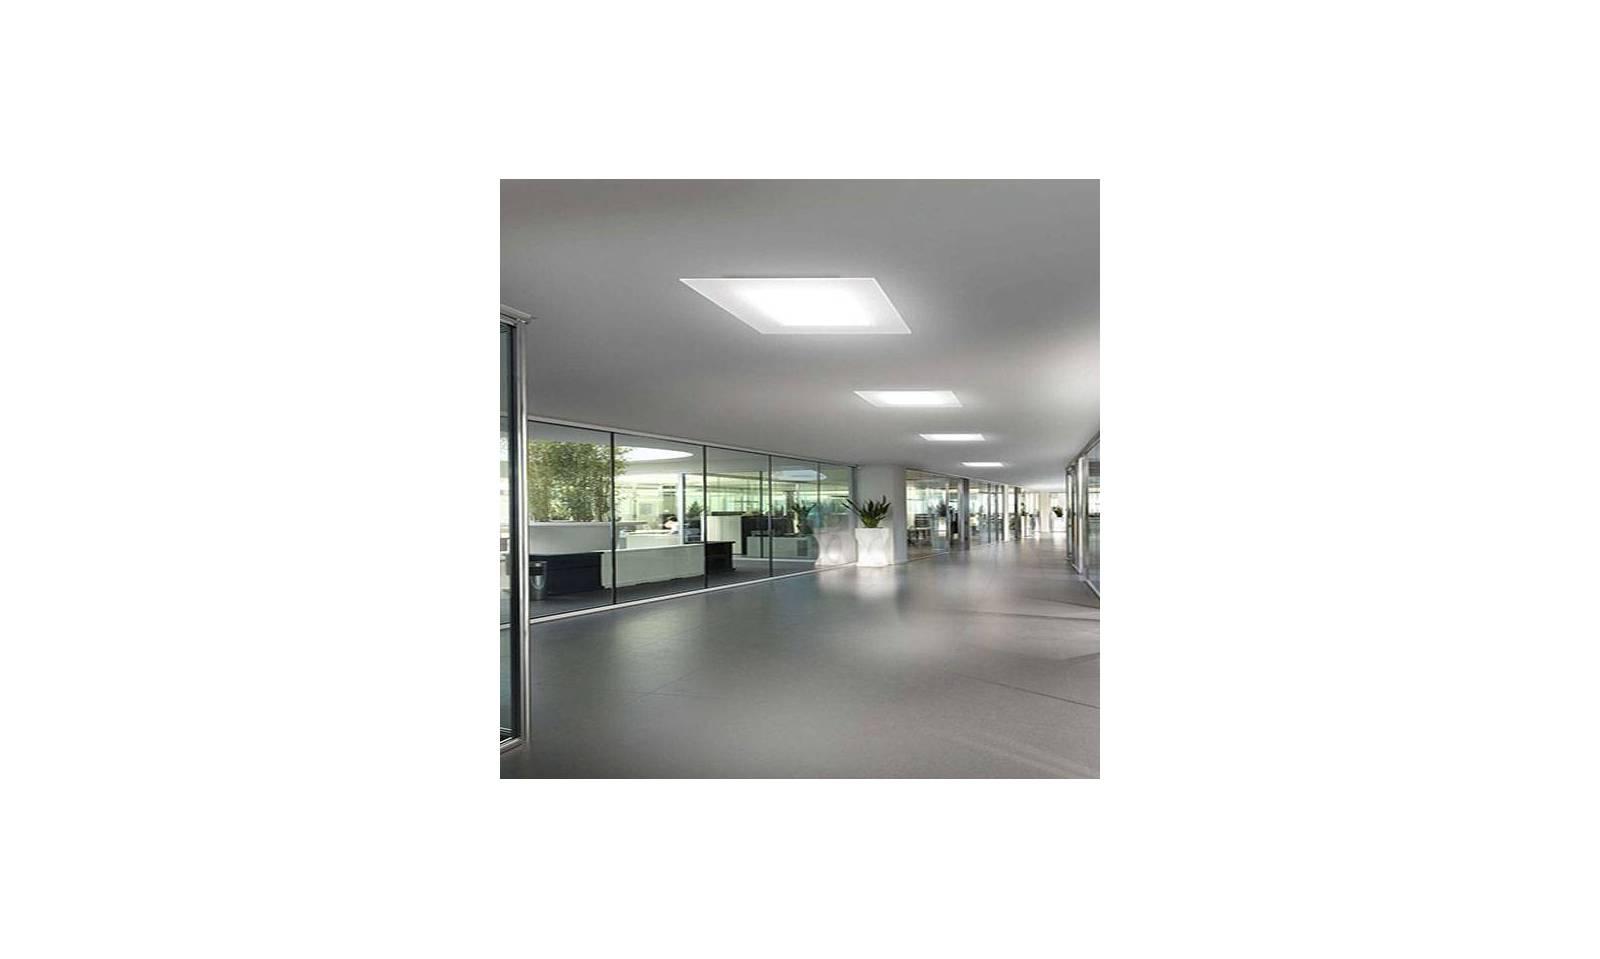 Linea light modern ceiling lamp dublight quadrata led lamp